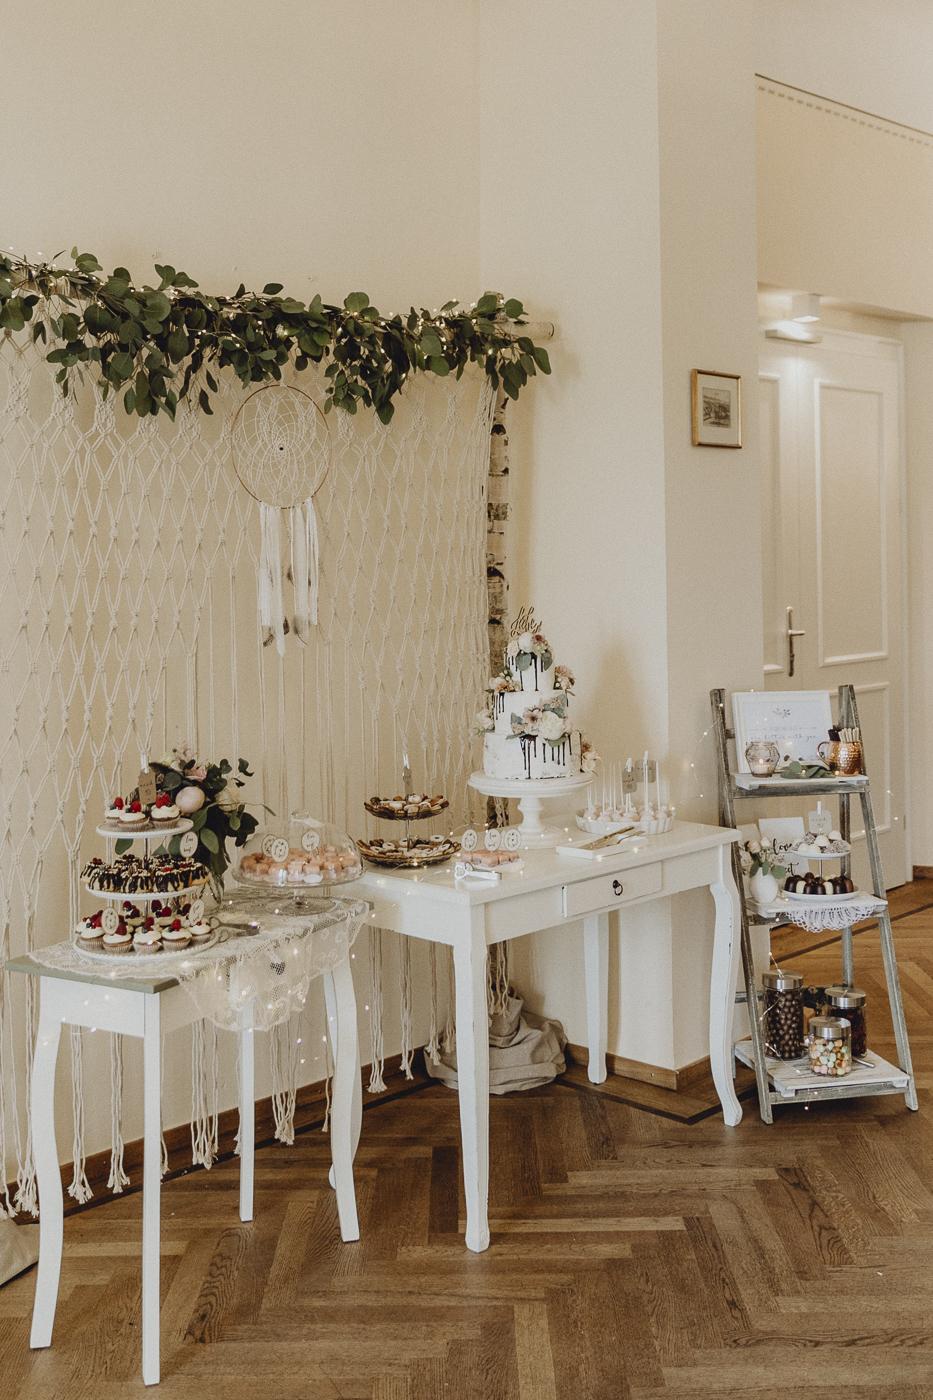 Kuchenbüffet Hochzeit Boho, Sweet Table Hochzeit Boho